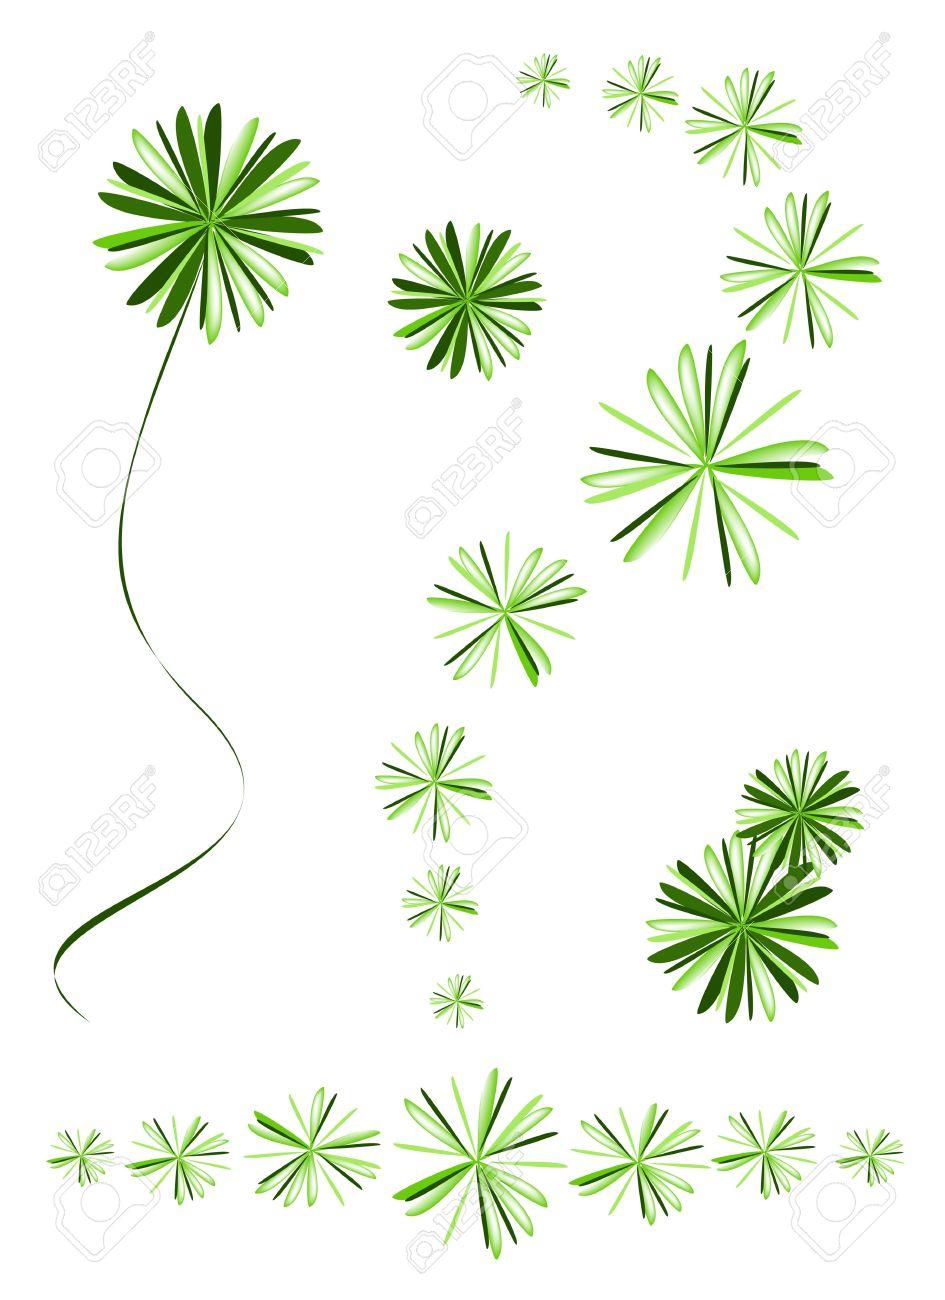 Ecological Concept, An Illustration Beautiful Green Foxtail Fern.